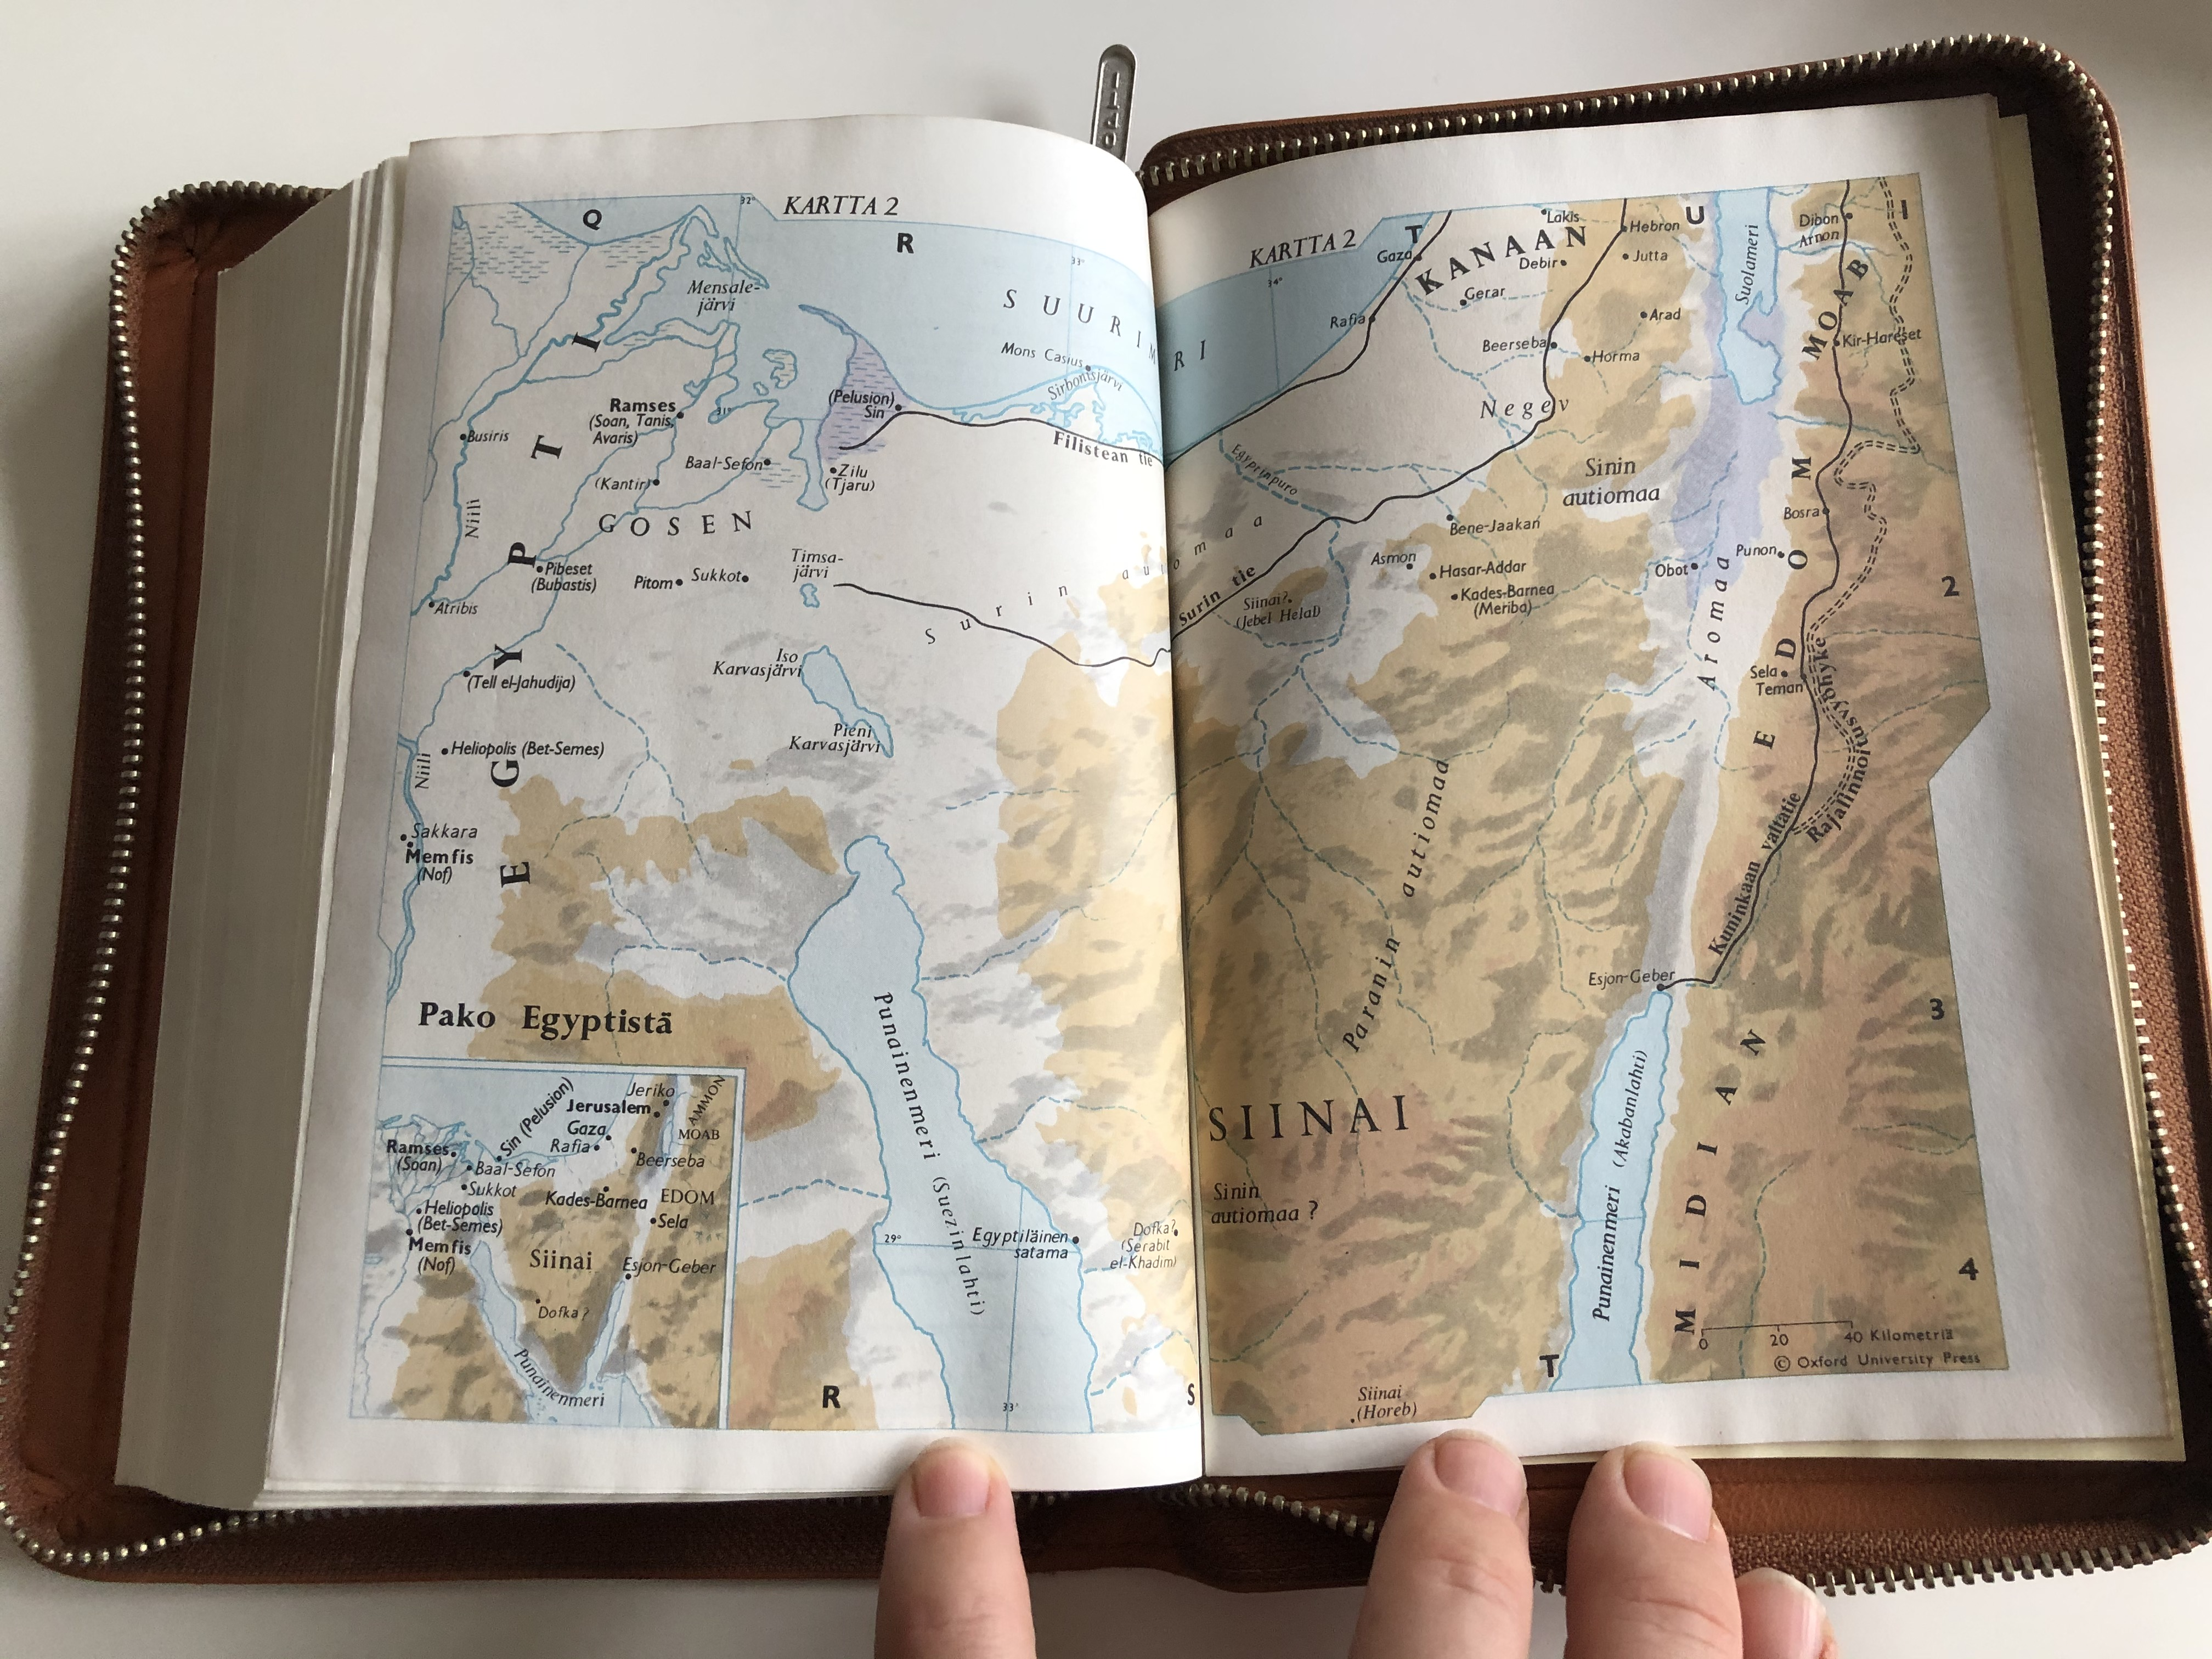 pyh-raamattu-finnish-language-brown-leather-bound-bible-19.jpg